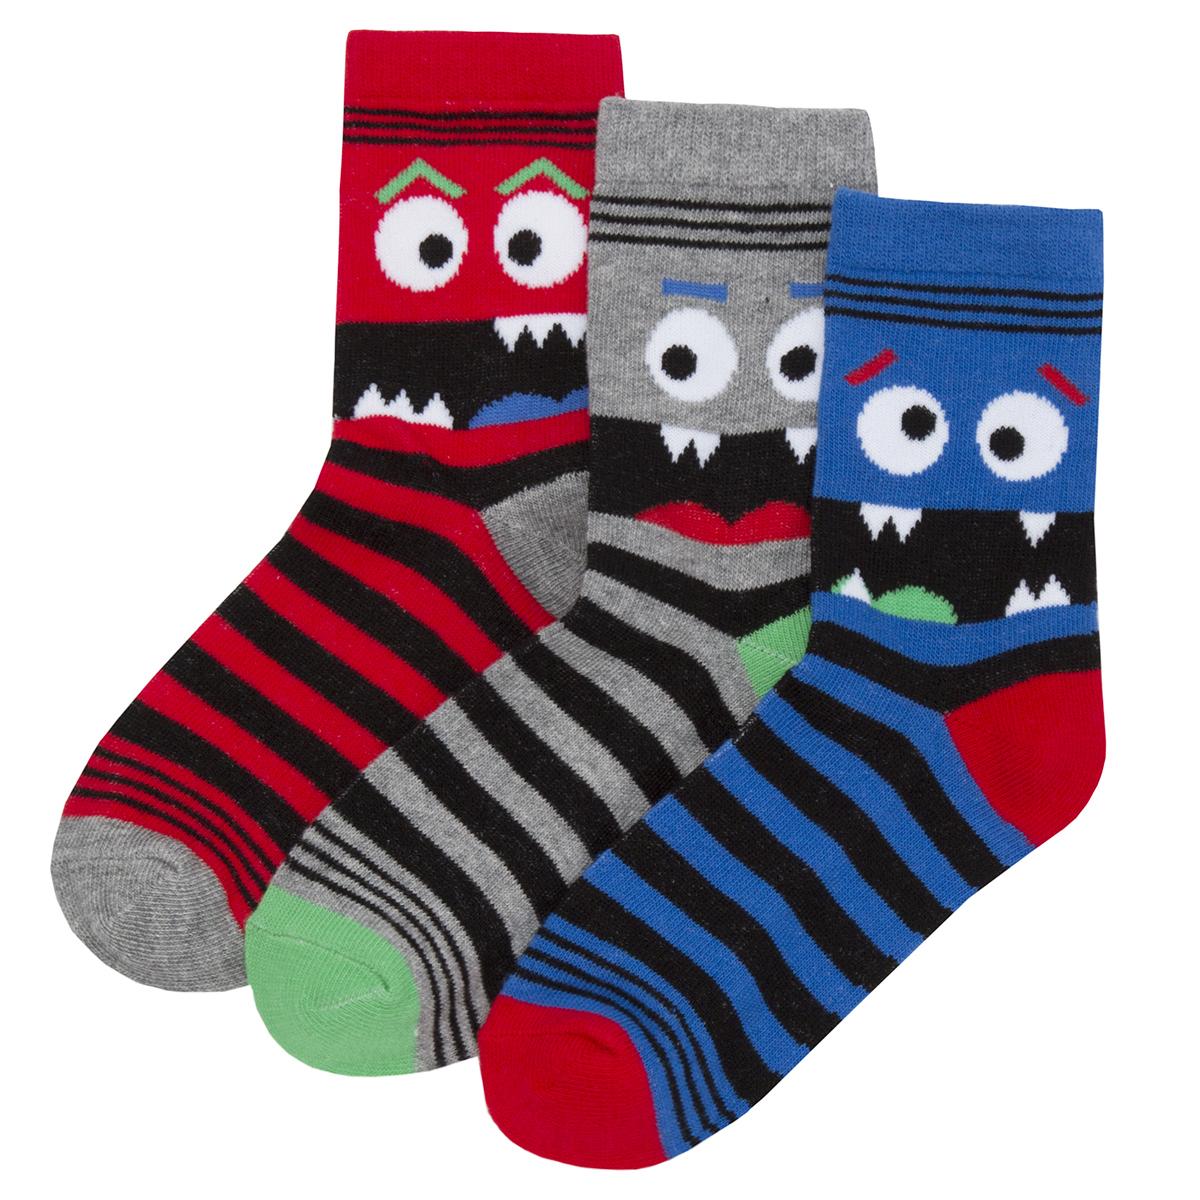 Kids Childrens Boys Novelty Cotton Socks Football Gaming Multipack 6-9 Pairs